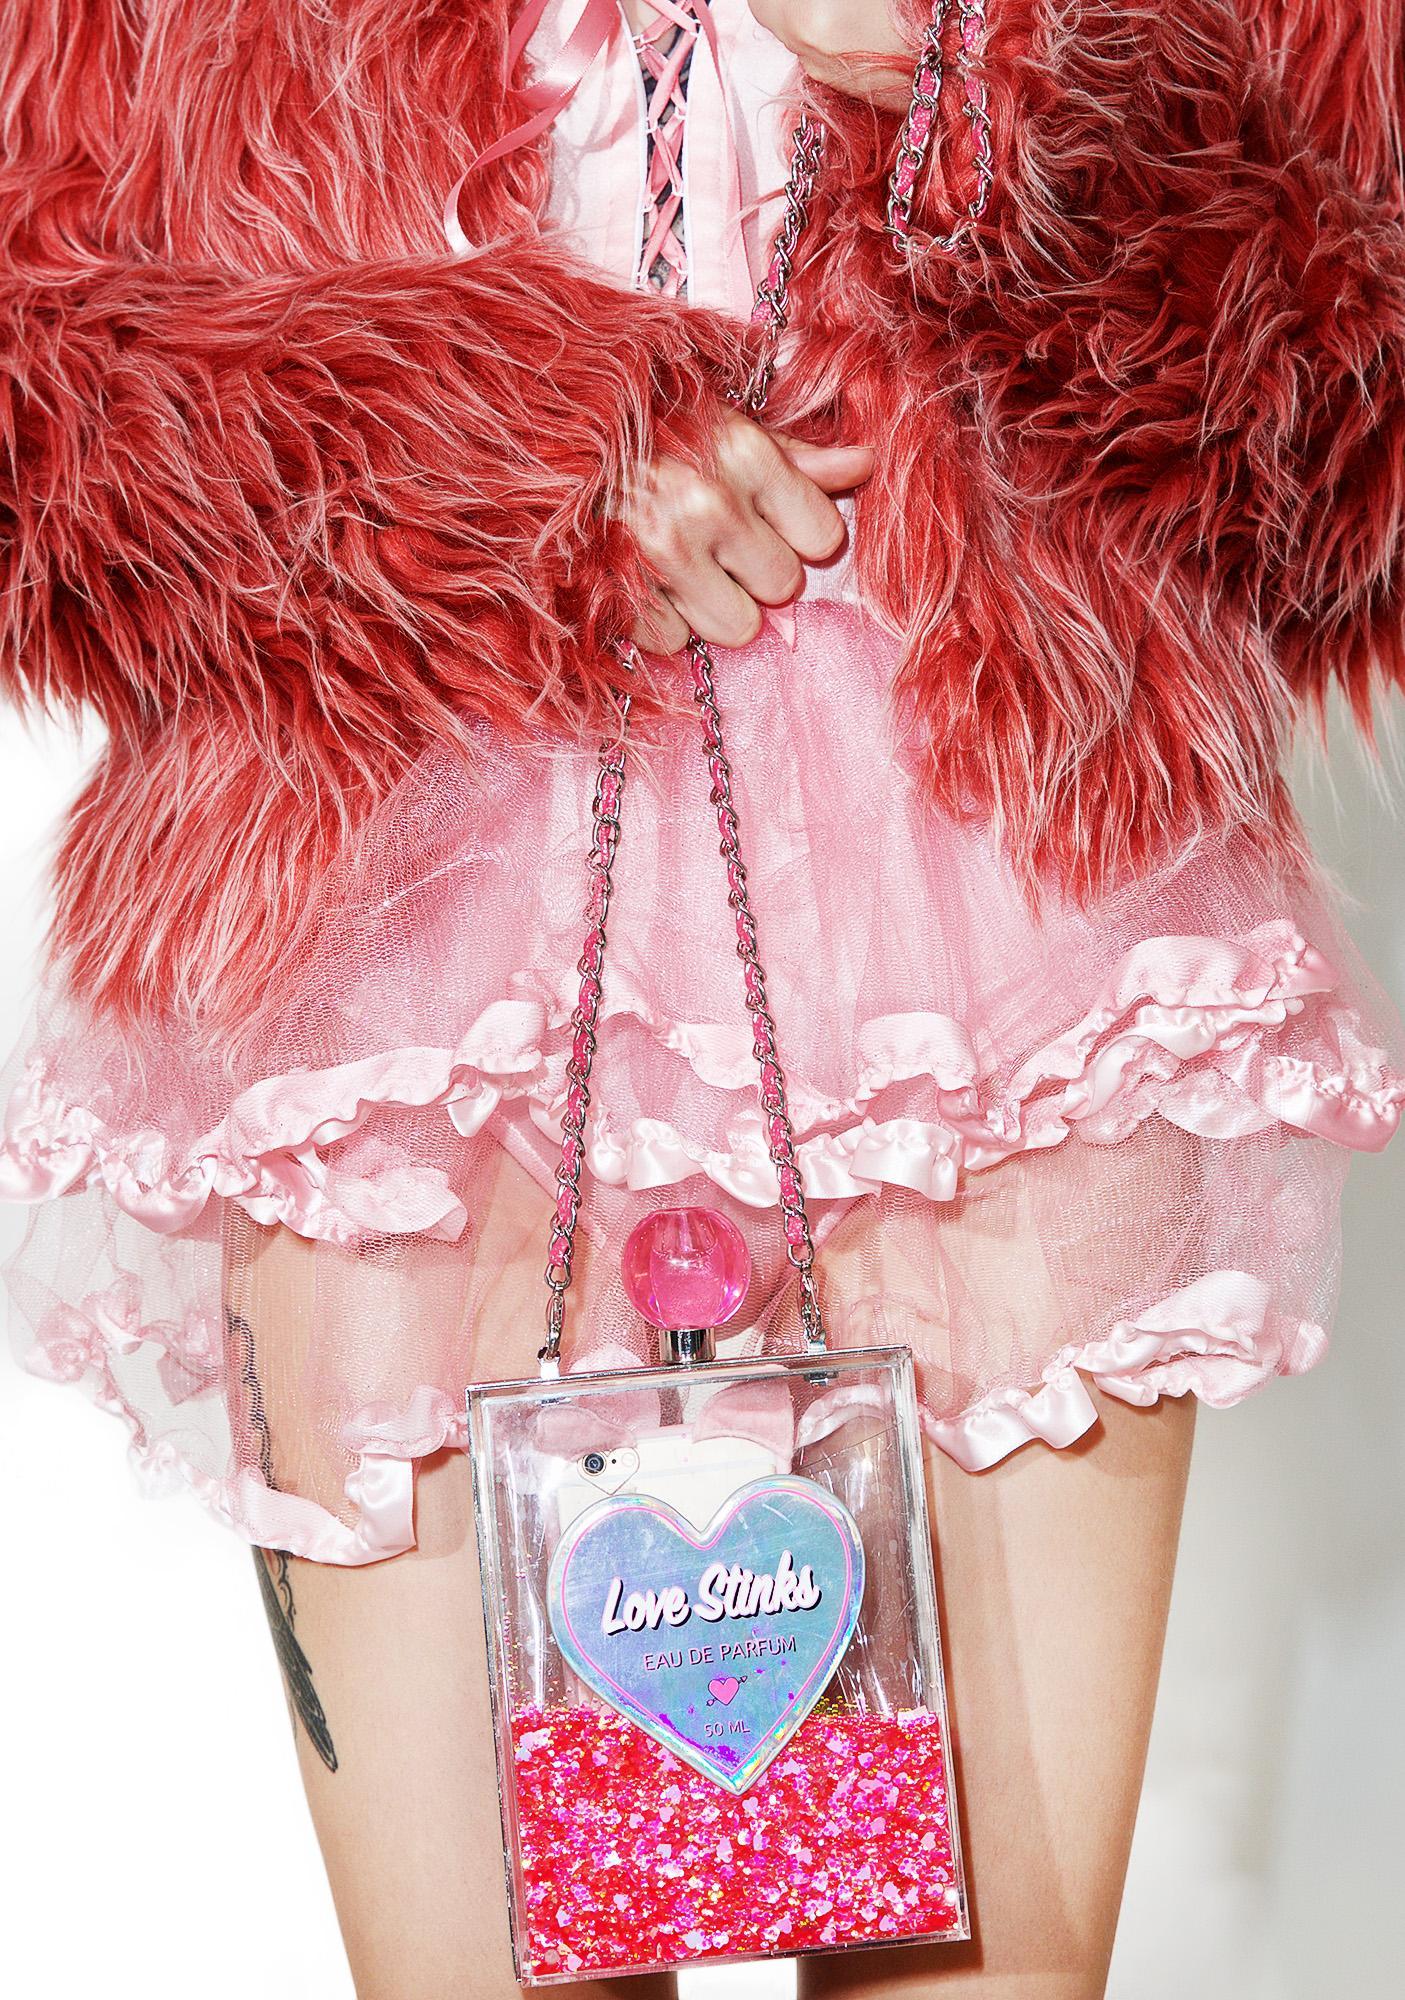 Sugarbaby Love Stinks Bag